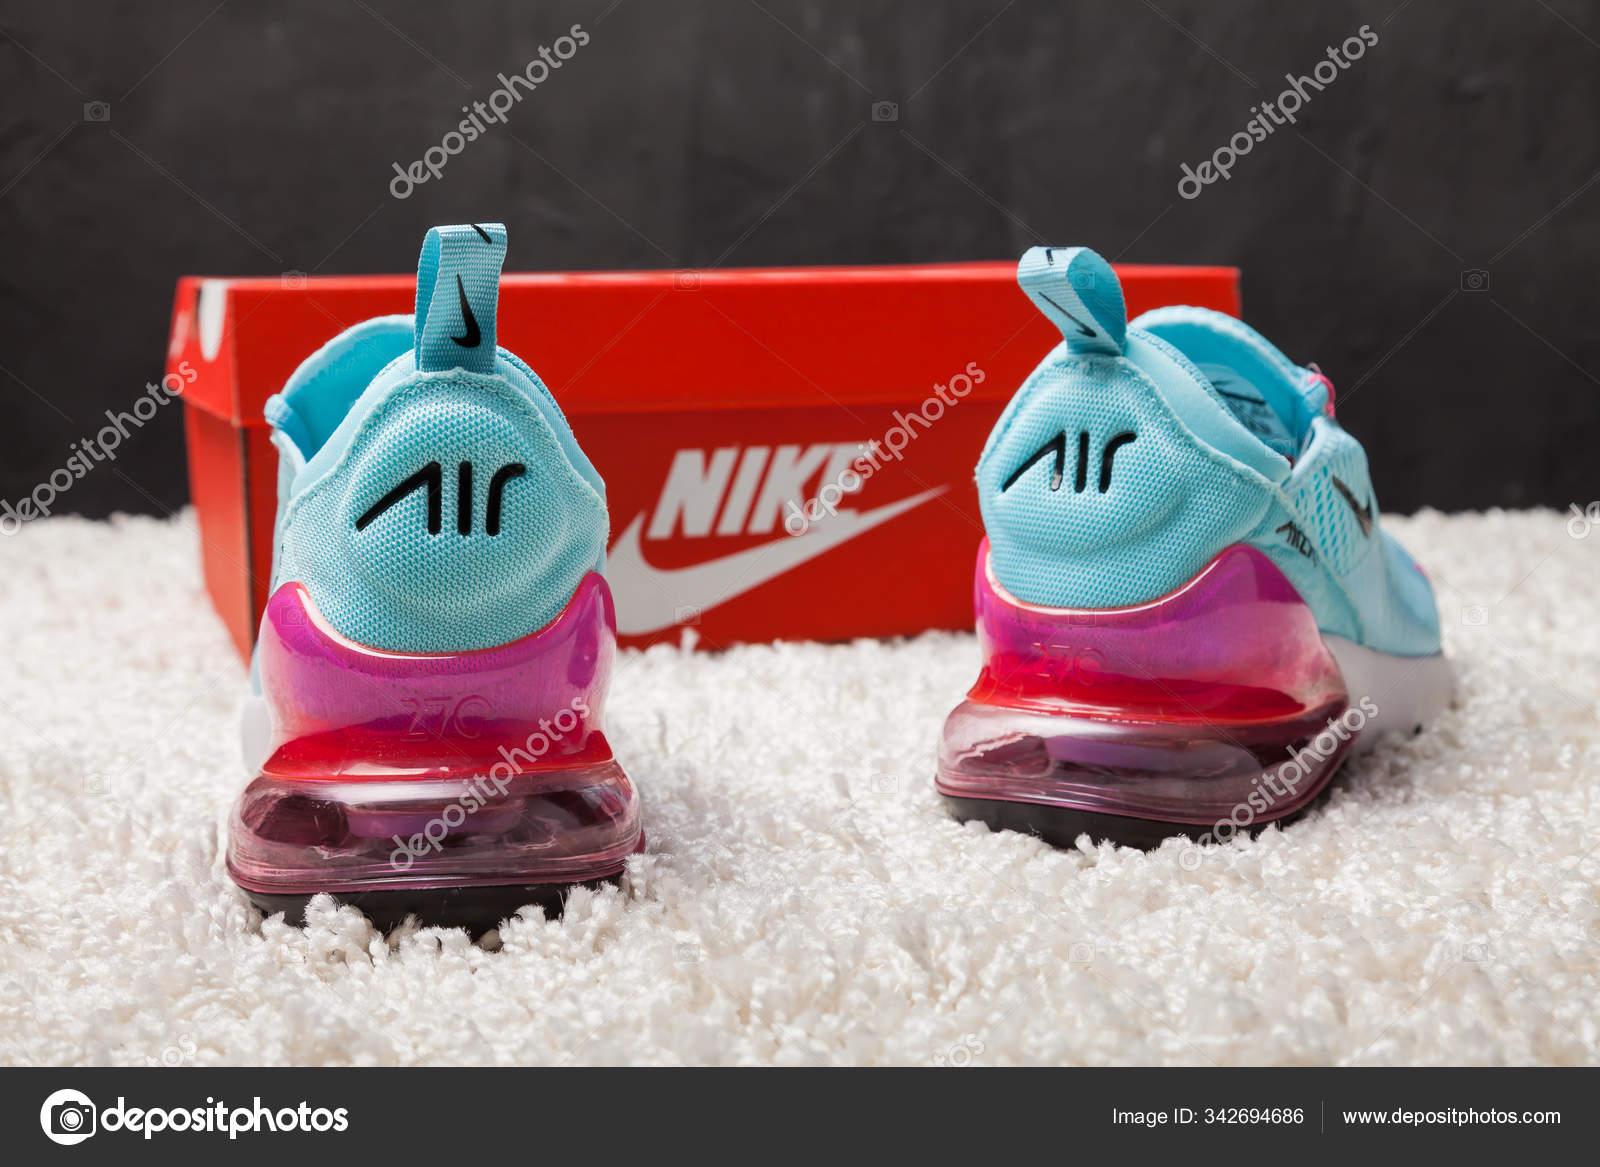 New Beautiful Colorful Nice Nike Air